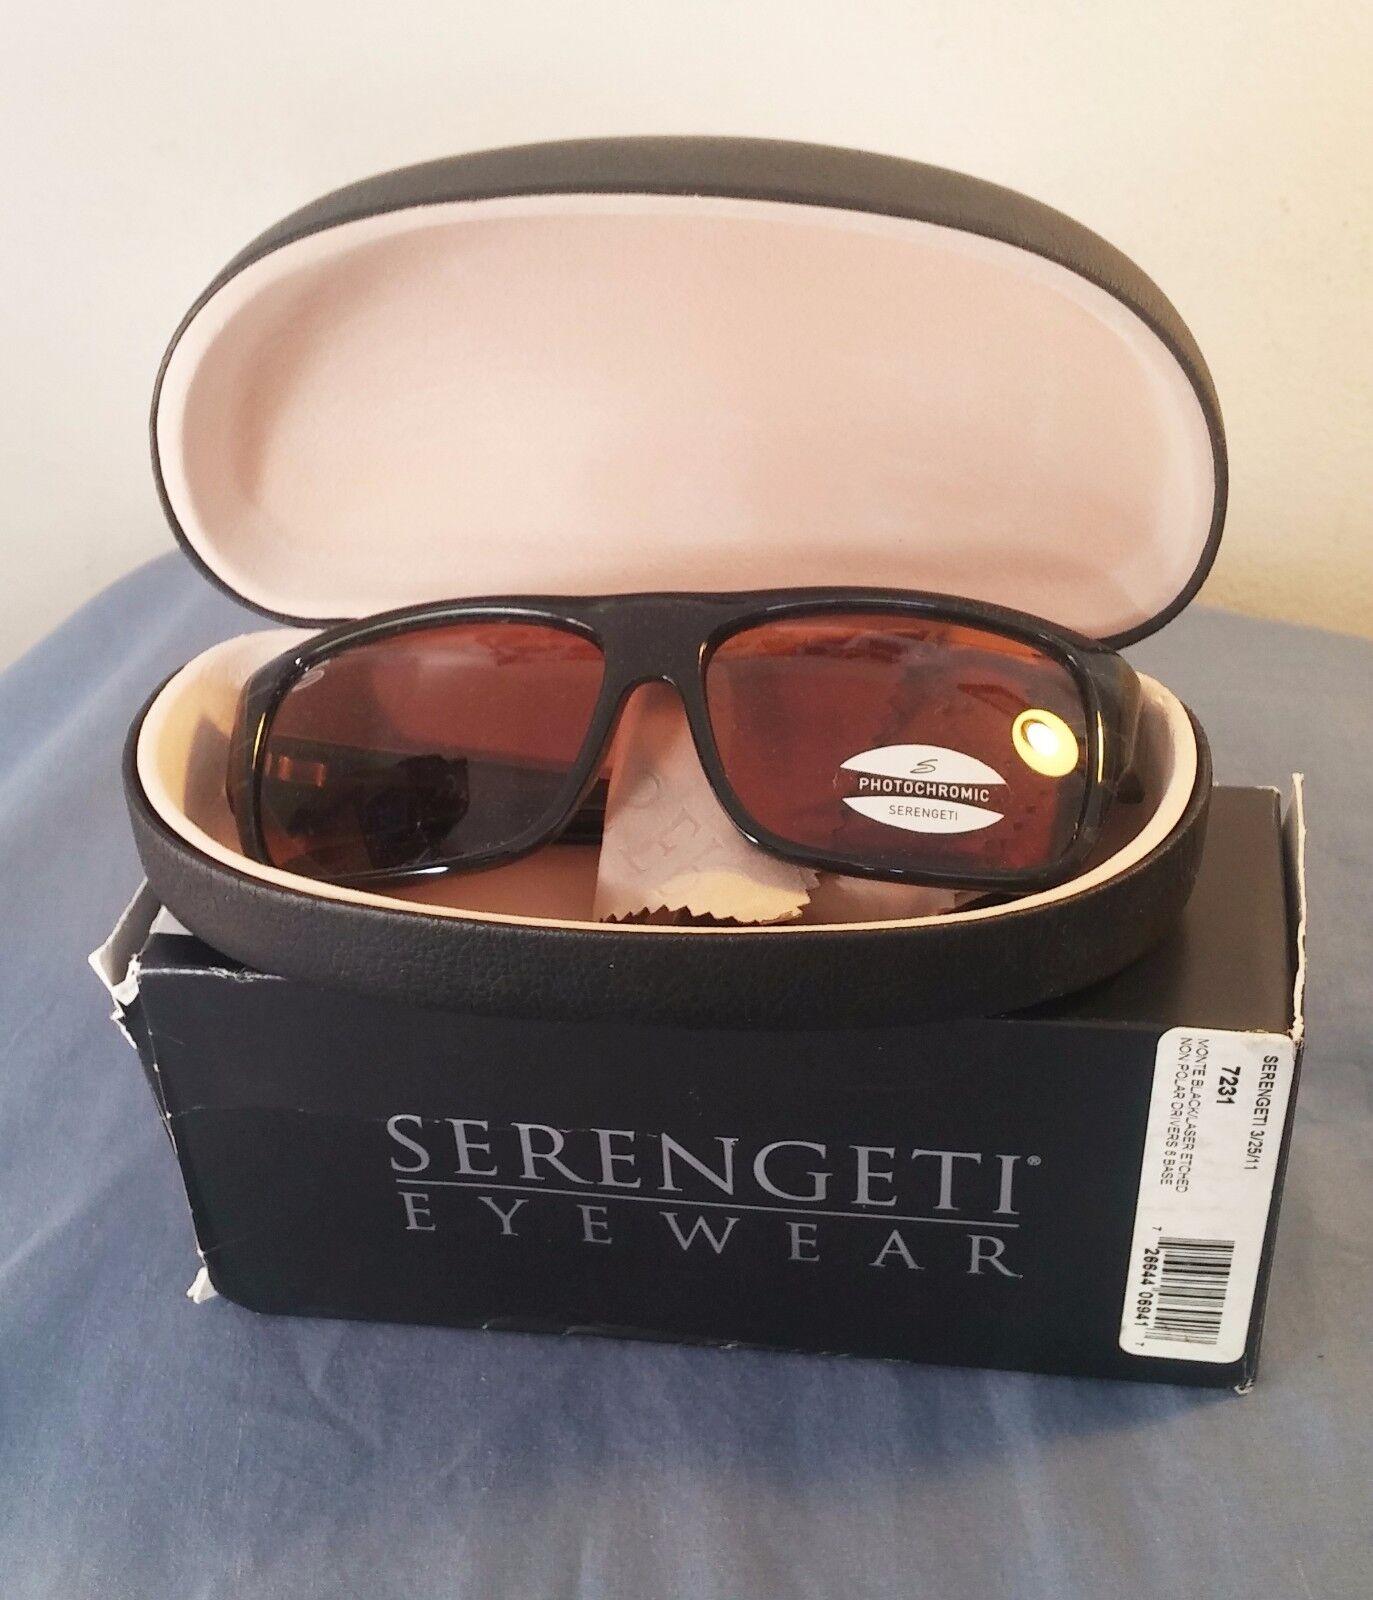 e7ed113c080c UPC 726644069417 product image for Serengeti Polarized Photochromic Monte  7230 Sunglasses Dark Tortoise/ Drivers ...